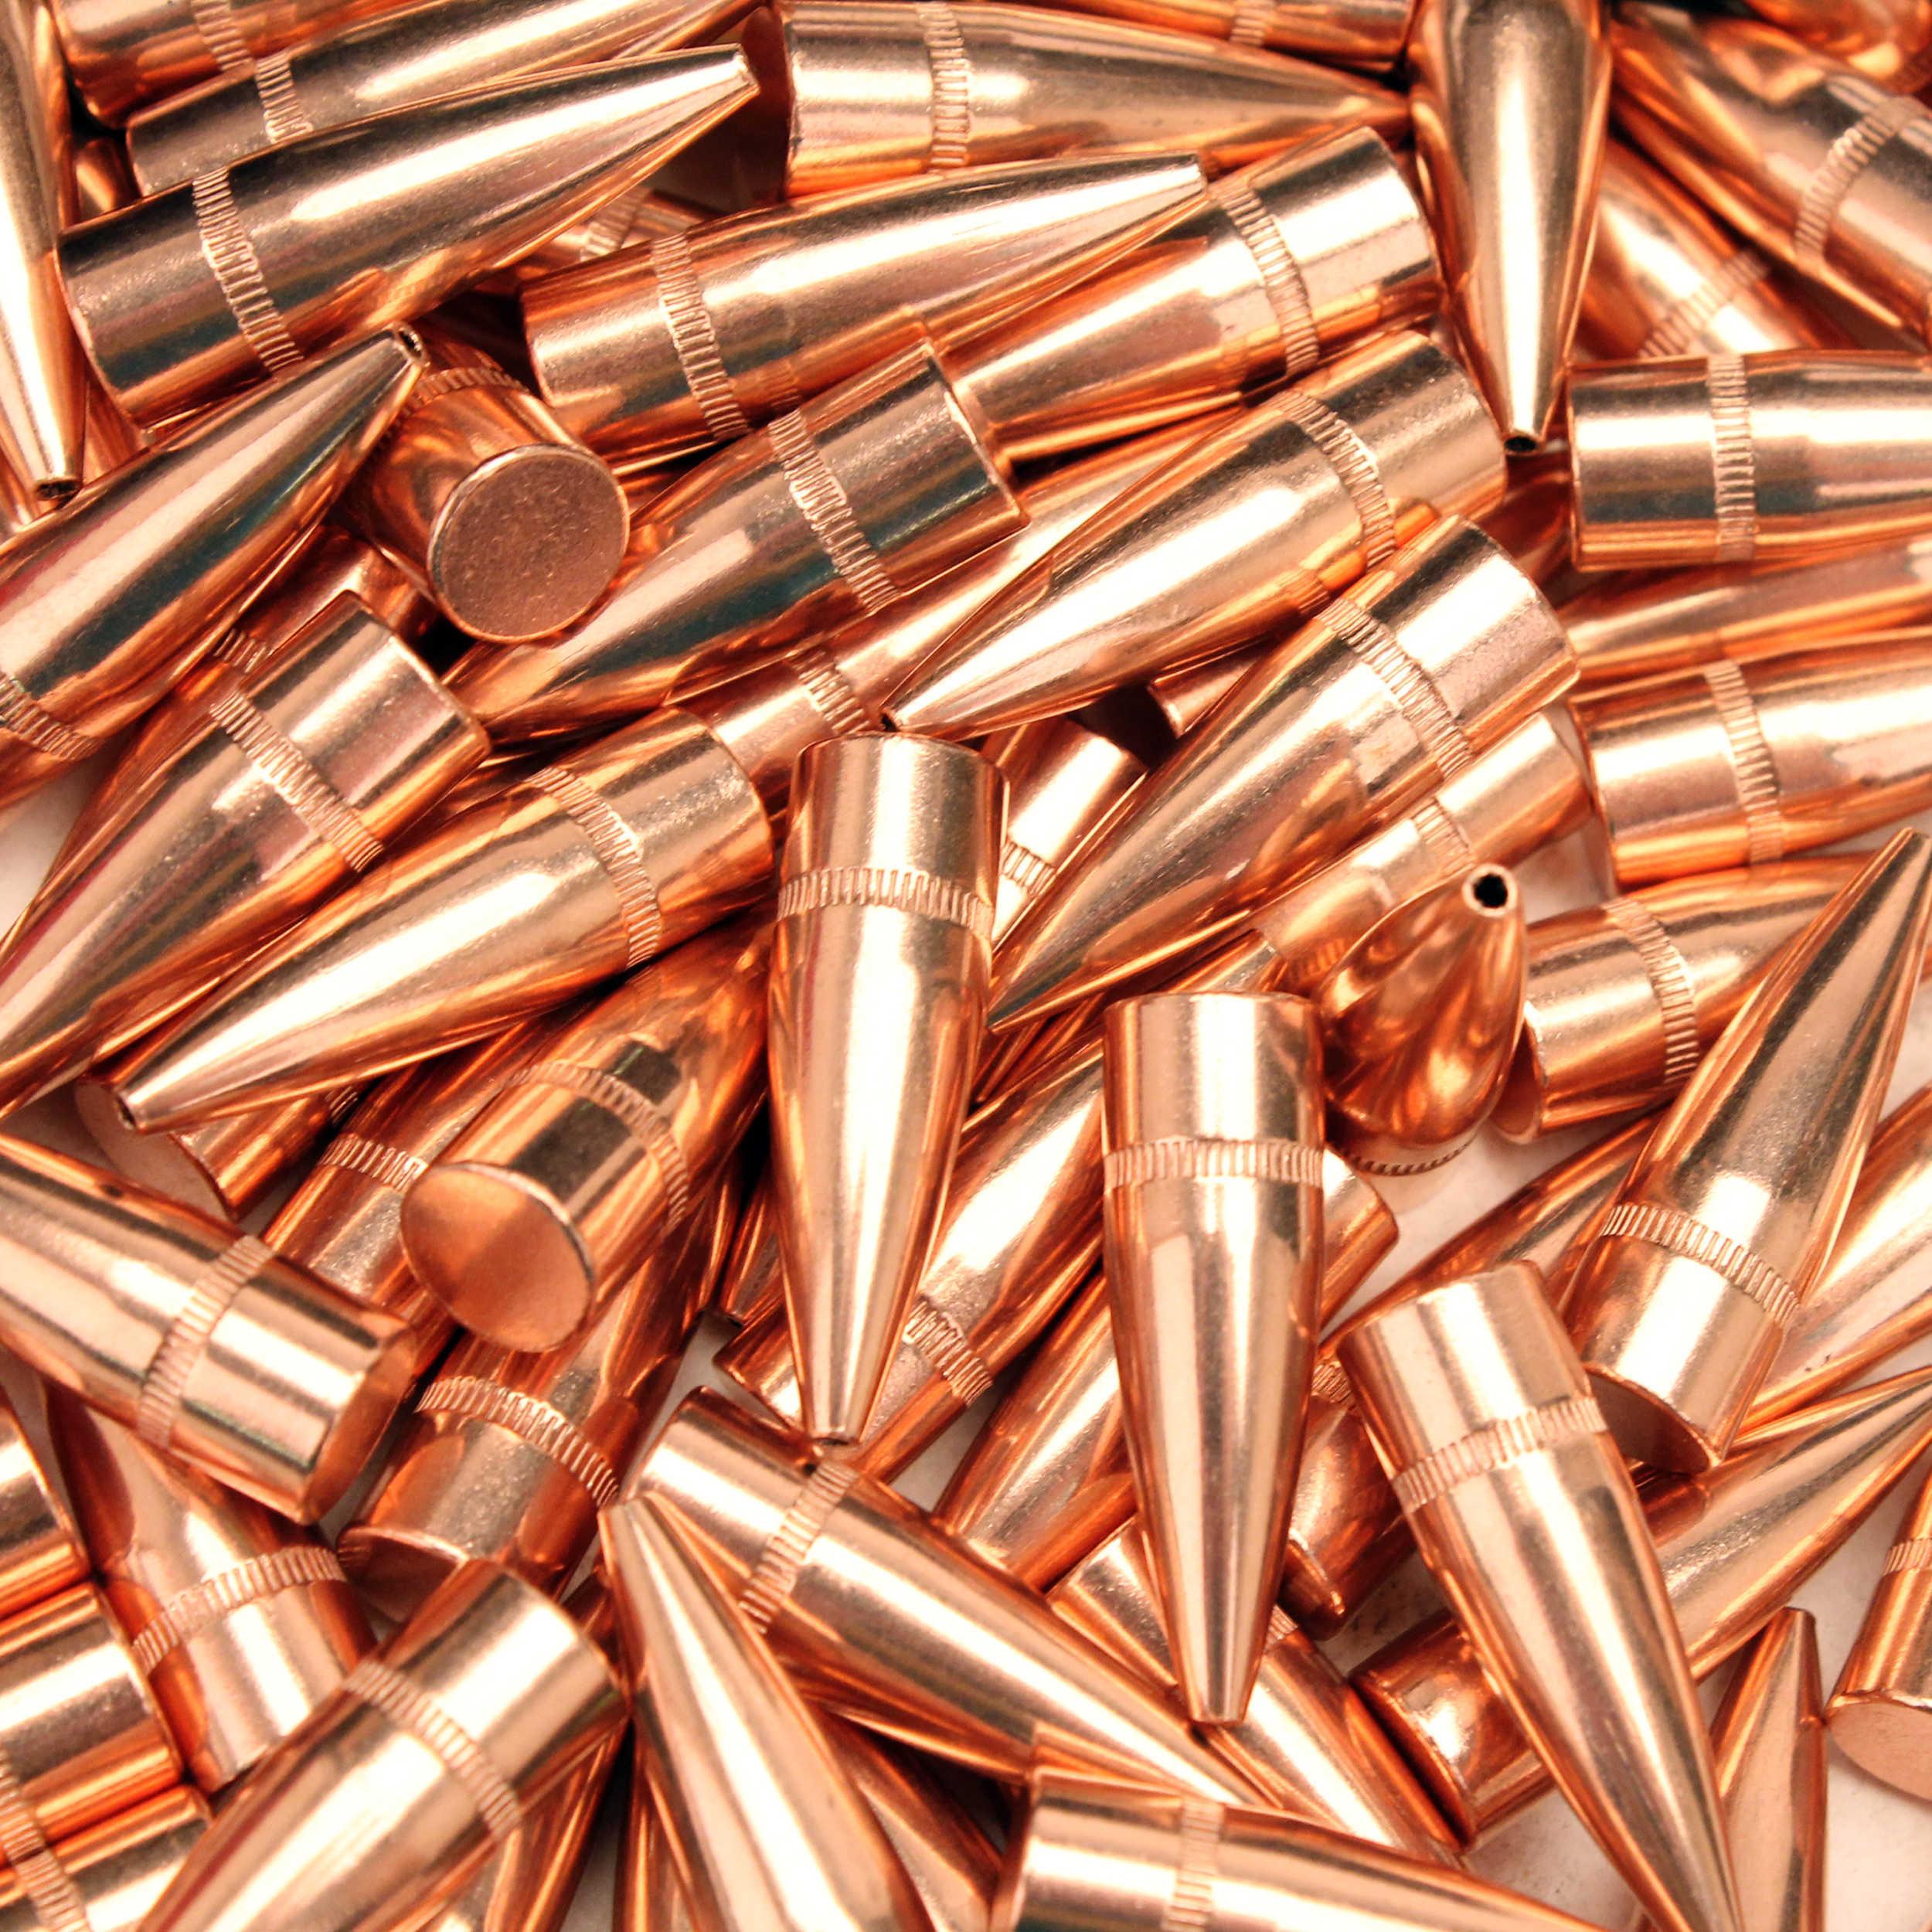 "Hornady 30 Caliber Bullets .308"", 125 Grain Hollow Point Reloading Bullets, 100 Per Box Md: 30192"